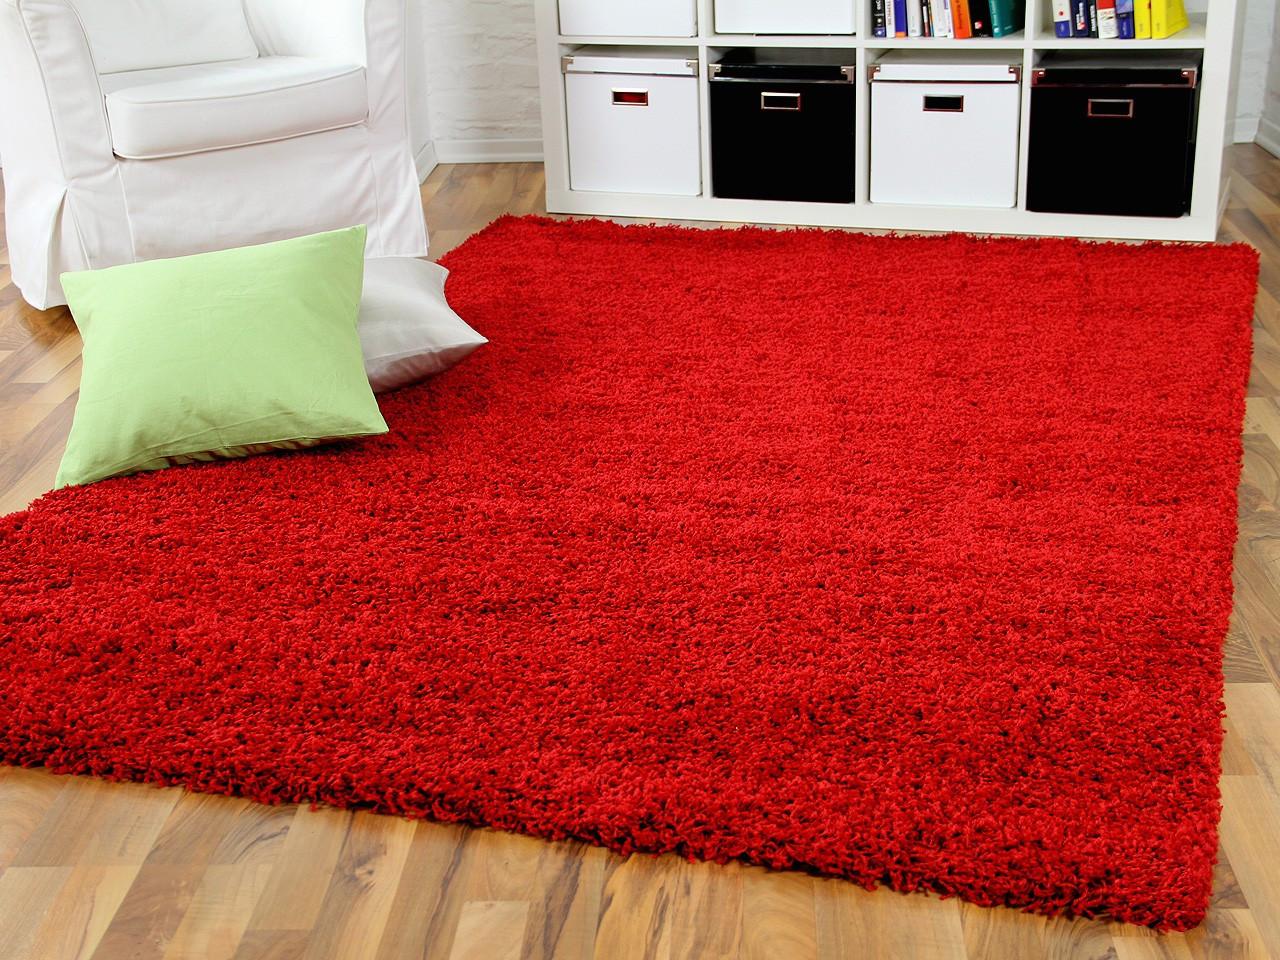 Teppich Rot  Hochflor Langflor Shaggy Teppich Aloha Rot Teppiche